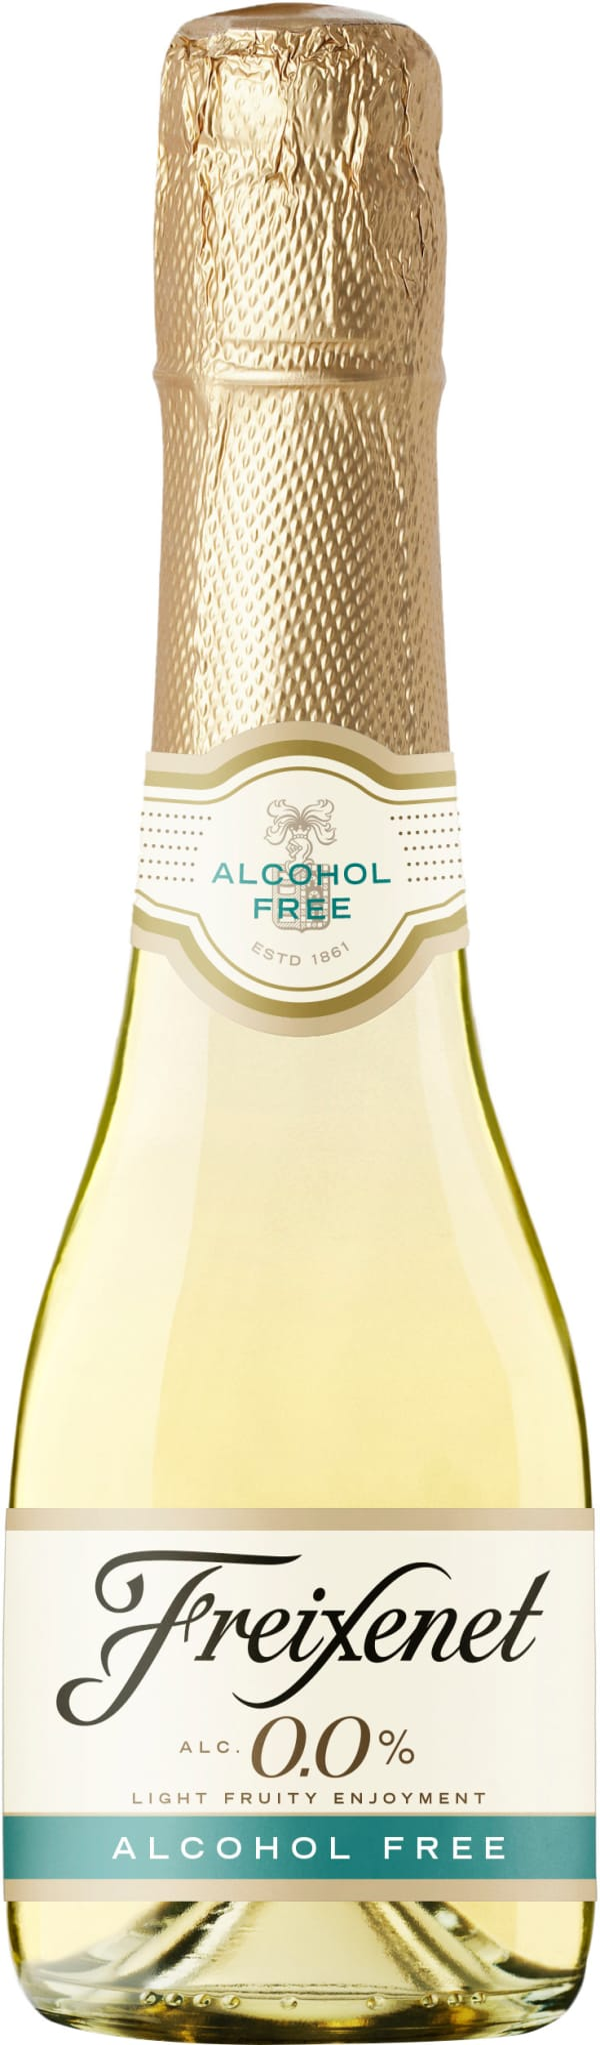 Freixenet Alcohol Free Sparkling